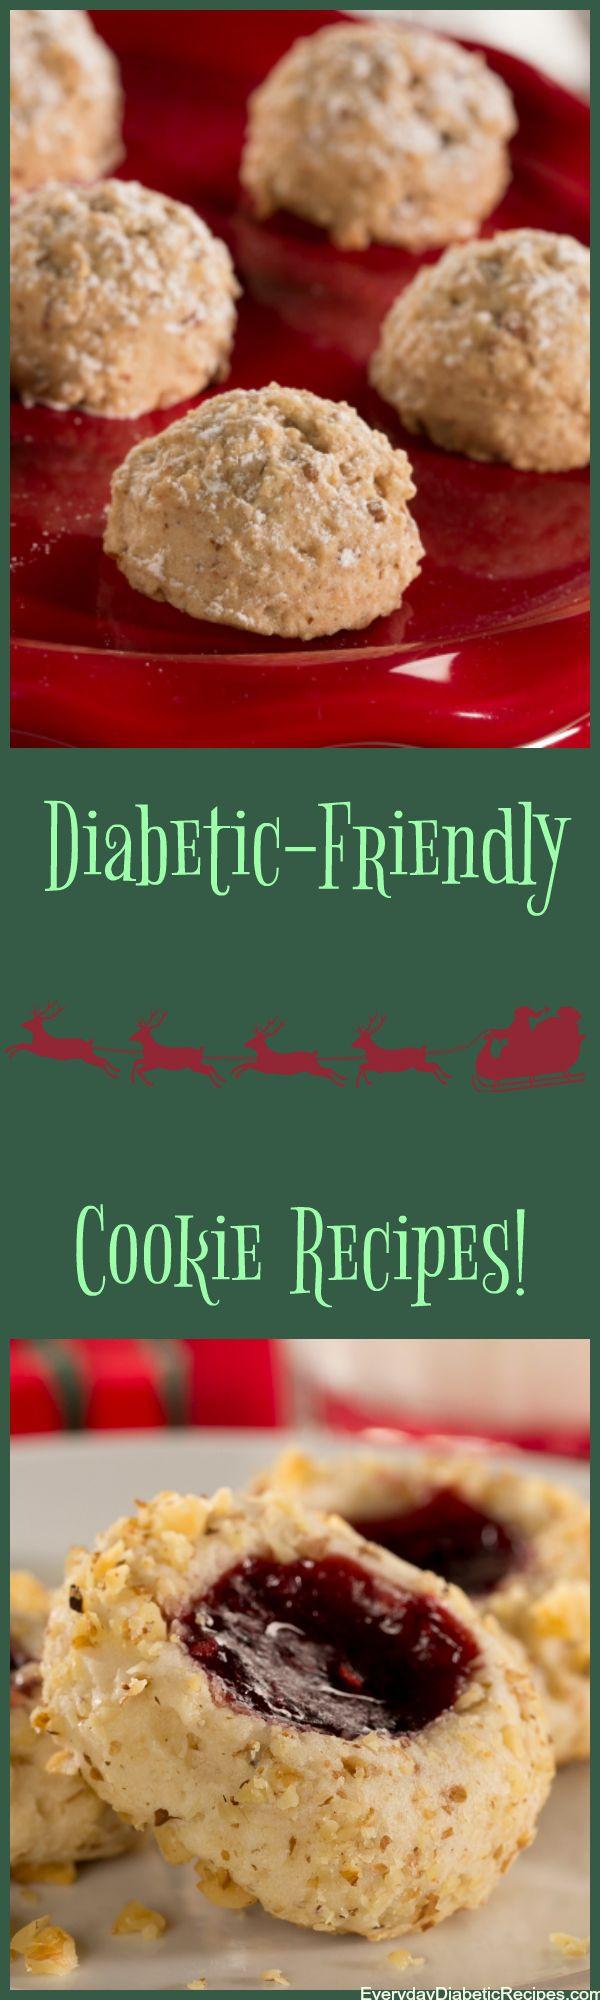 Diabetic Friendly Desserts Recipe  207 best Diabetic Friendly Desserts images on Pinterest